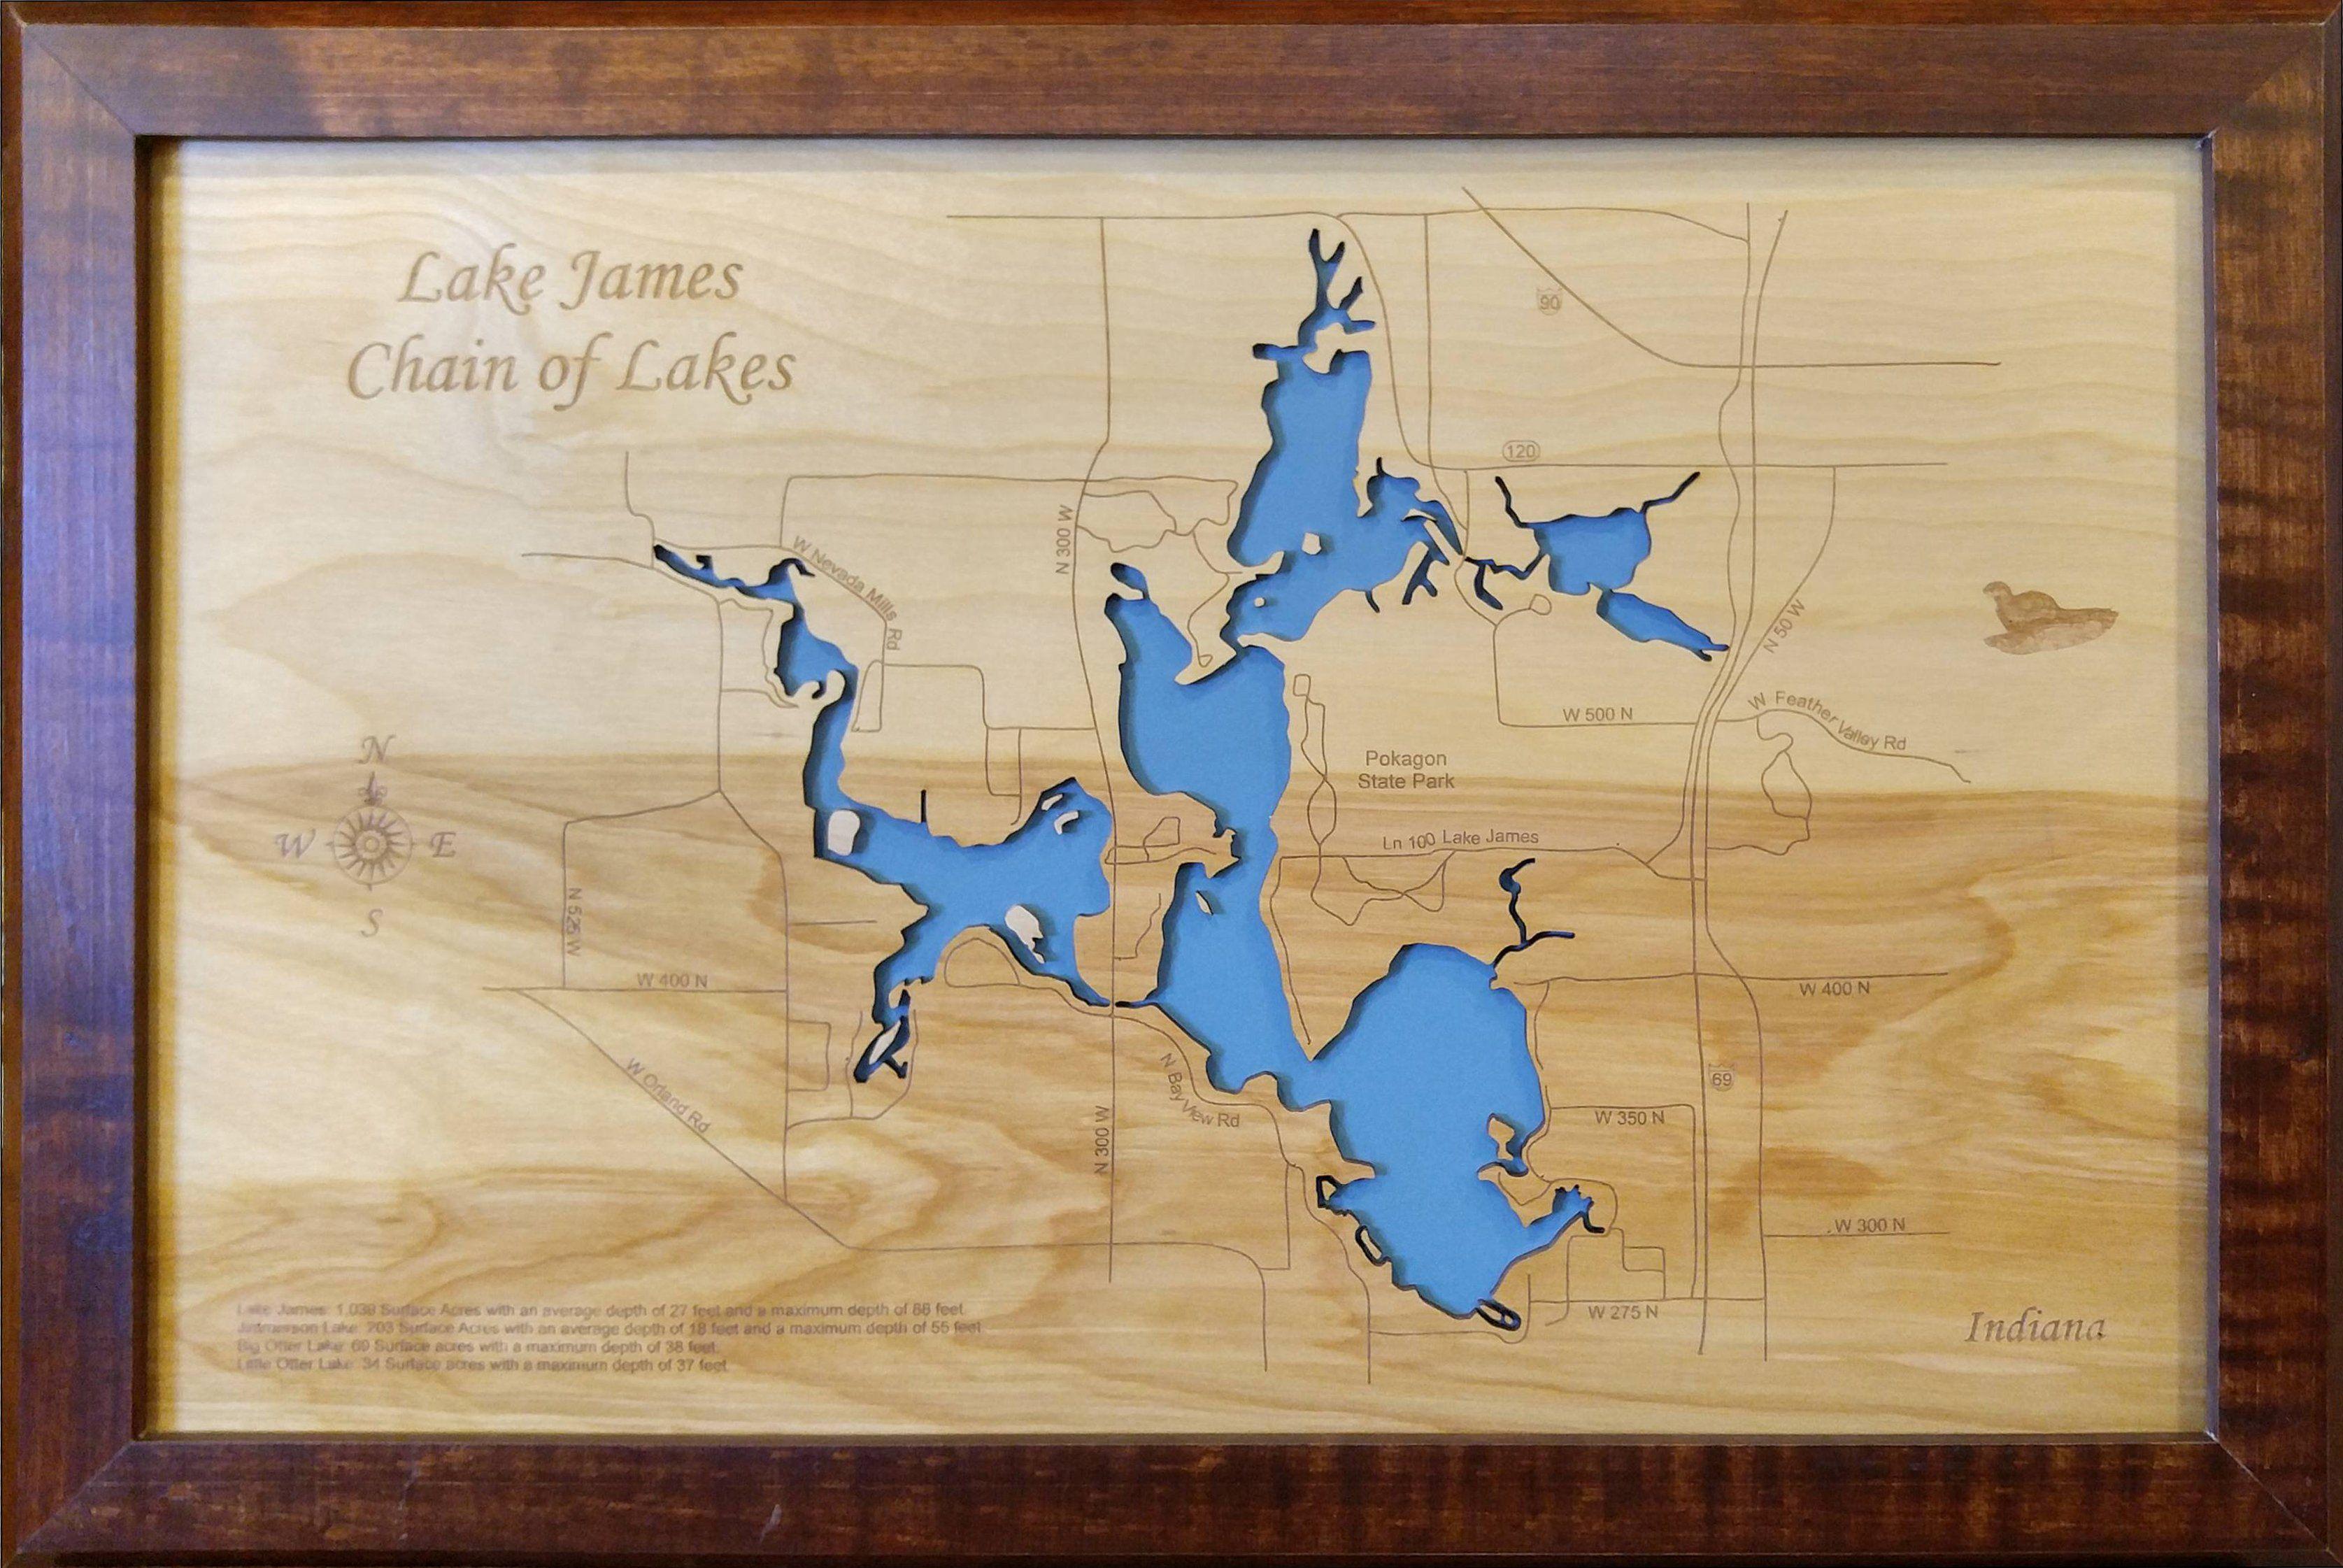 lake james indiana map Pin On Lake James Chain Of Lakes Indiana lake james indiana map